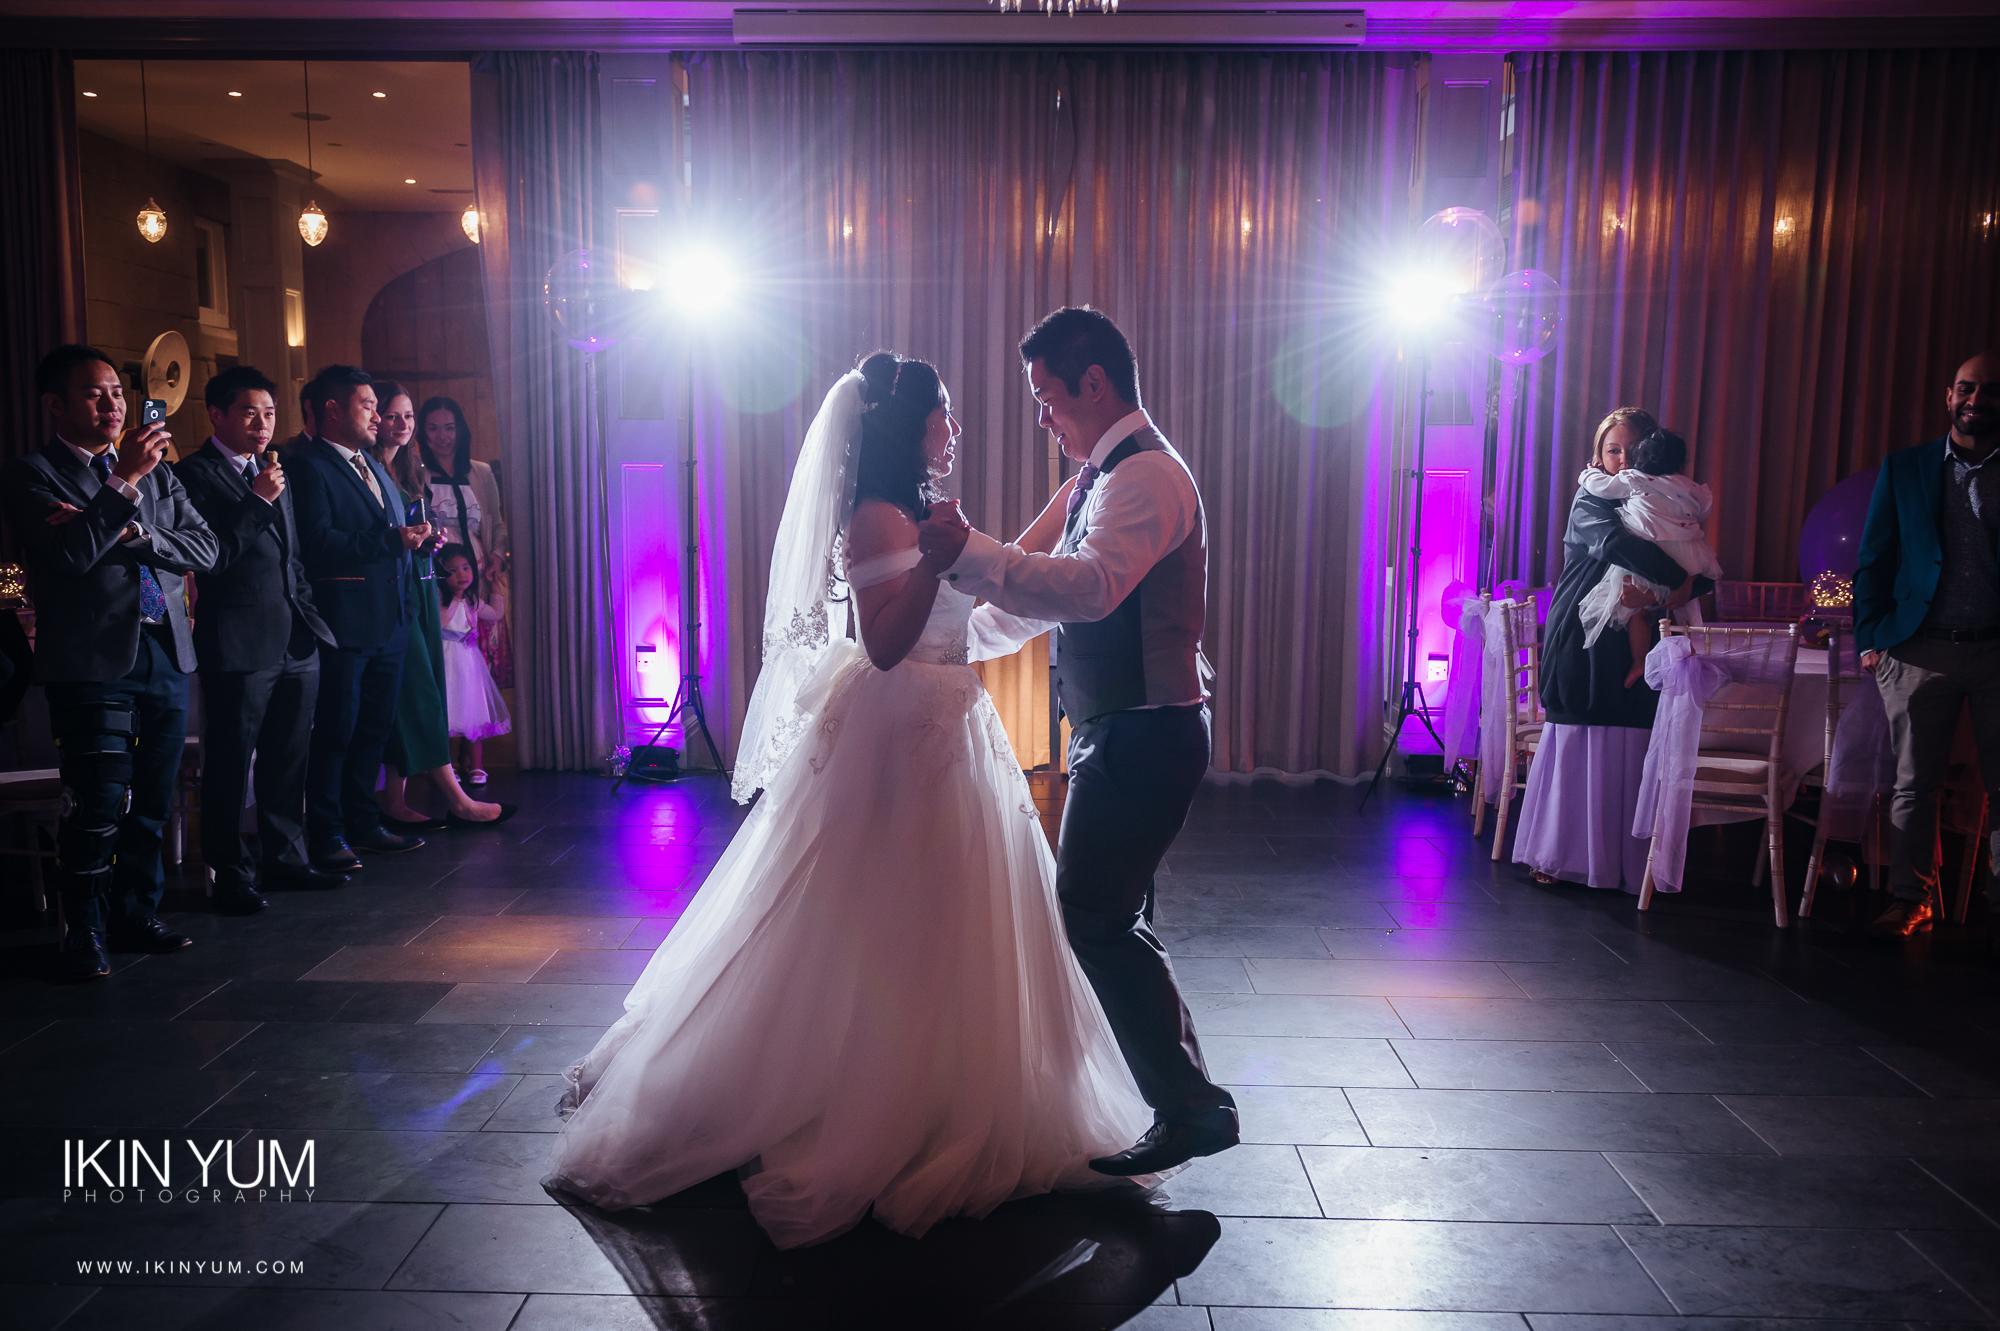 Hampton Manor Wedding - Ikin Yum Photography -162.jpg